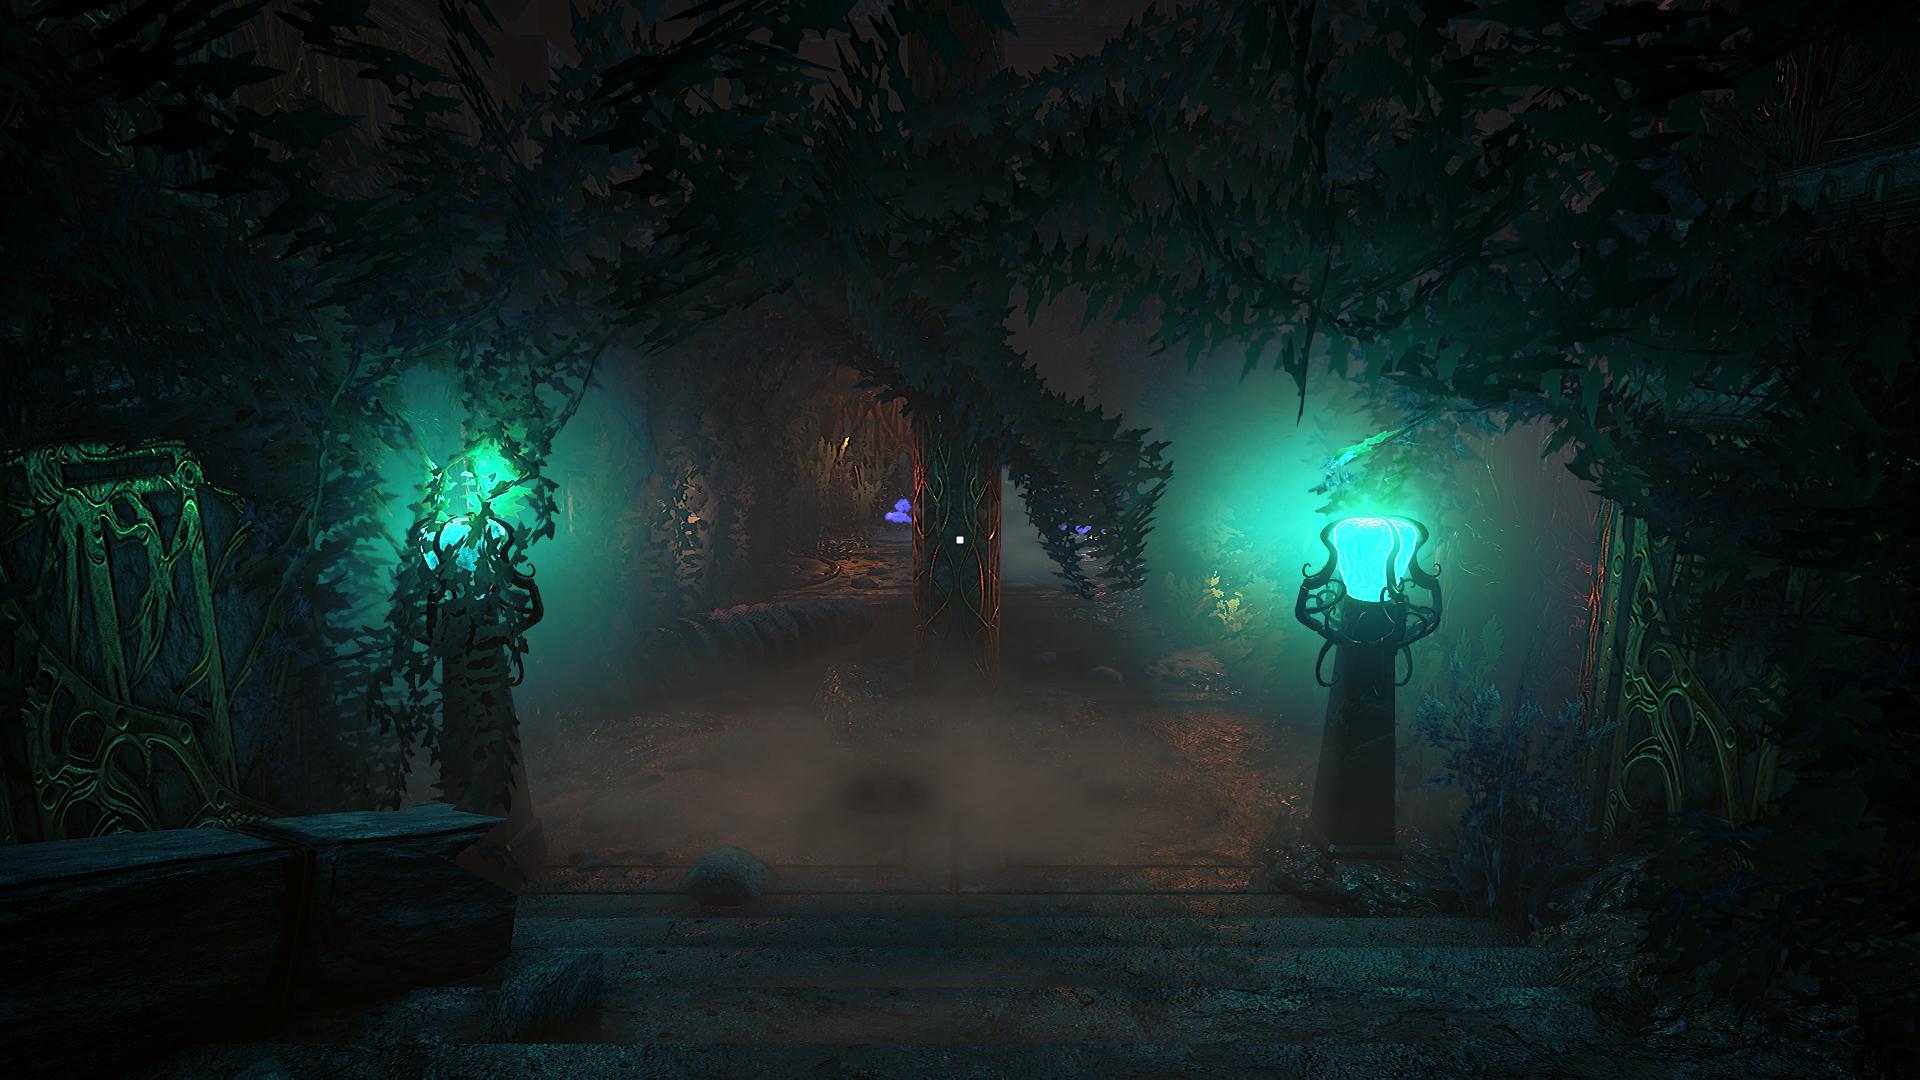 Two glowing green orbs illuminate an overgrown courtyard in a screenshot from Conarium